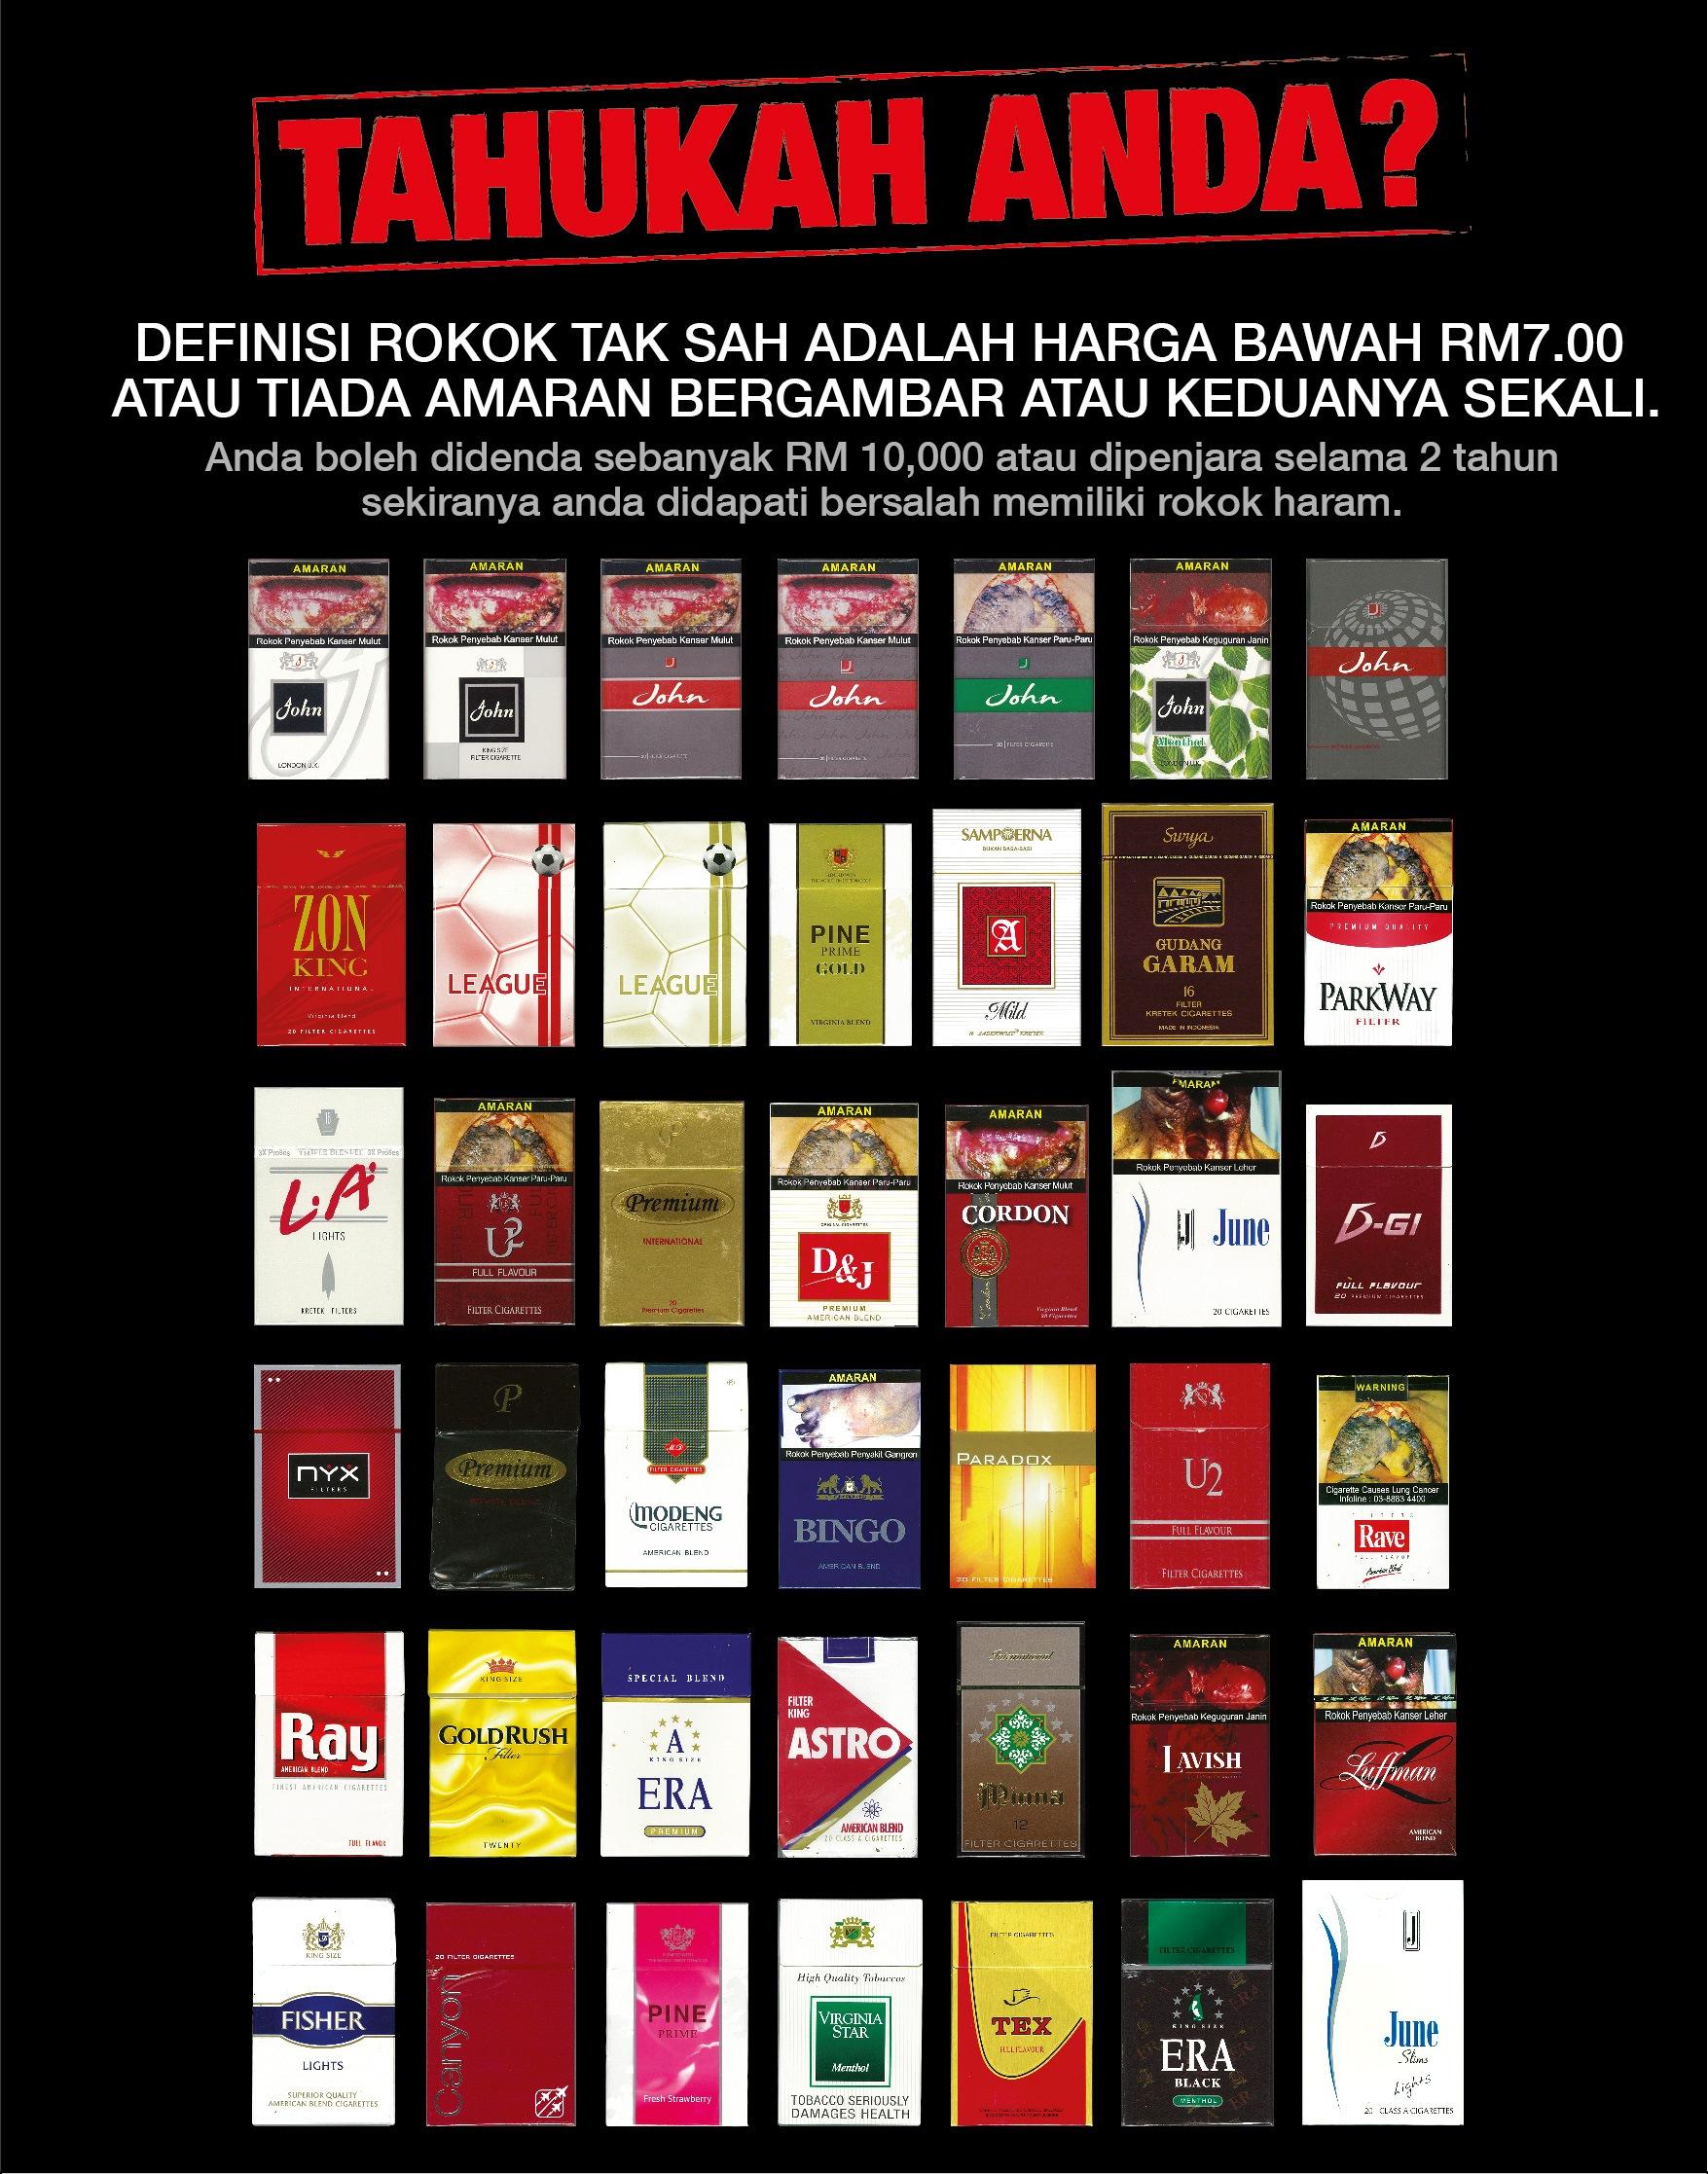 Definisi rokok tak sah adalah harga bawah RM7.00 atau tiada amaran bergambar atau keduanya sekali.